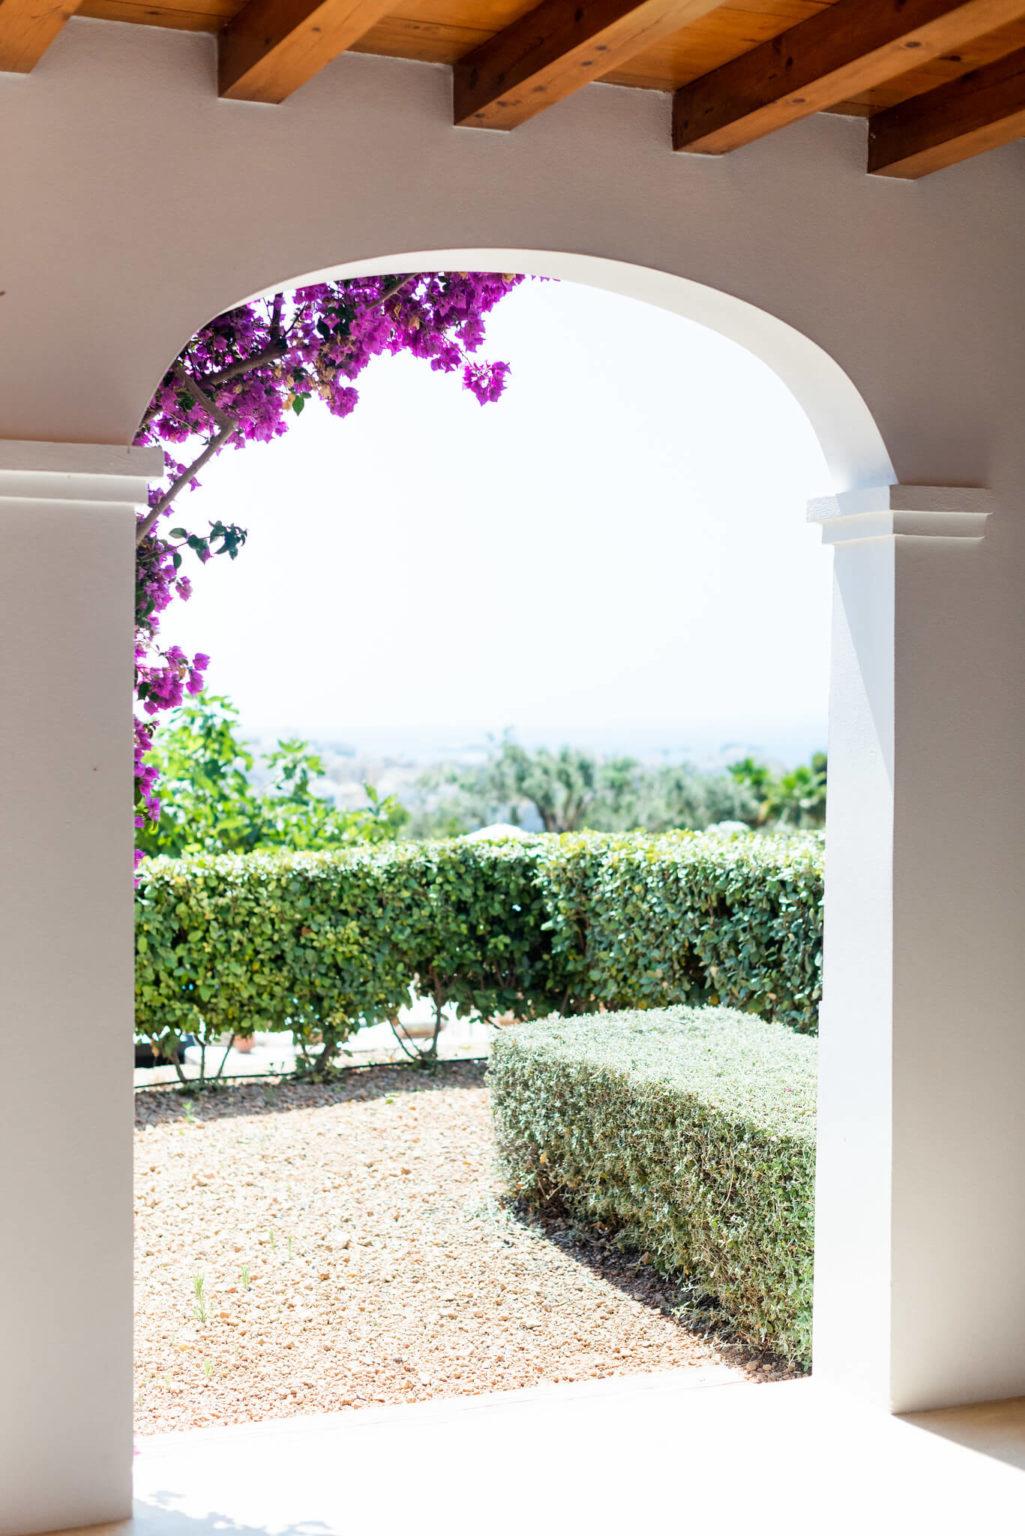 https://www.white-ibiza.com/wp-content/uploads/2020/03/white-ibiza-boutique-hotels-casa-maca-2020-11-1025x1536.jpg